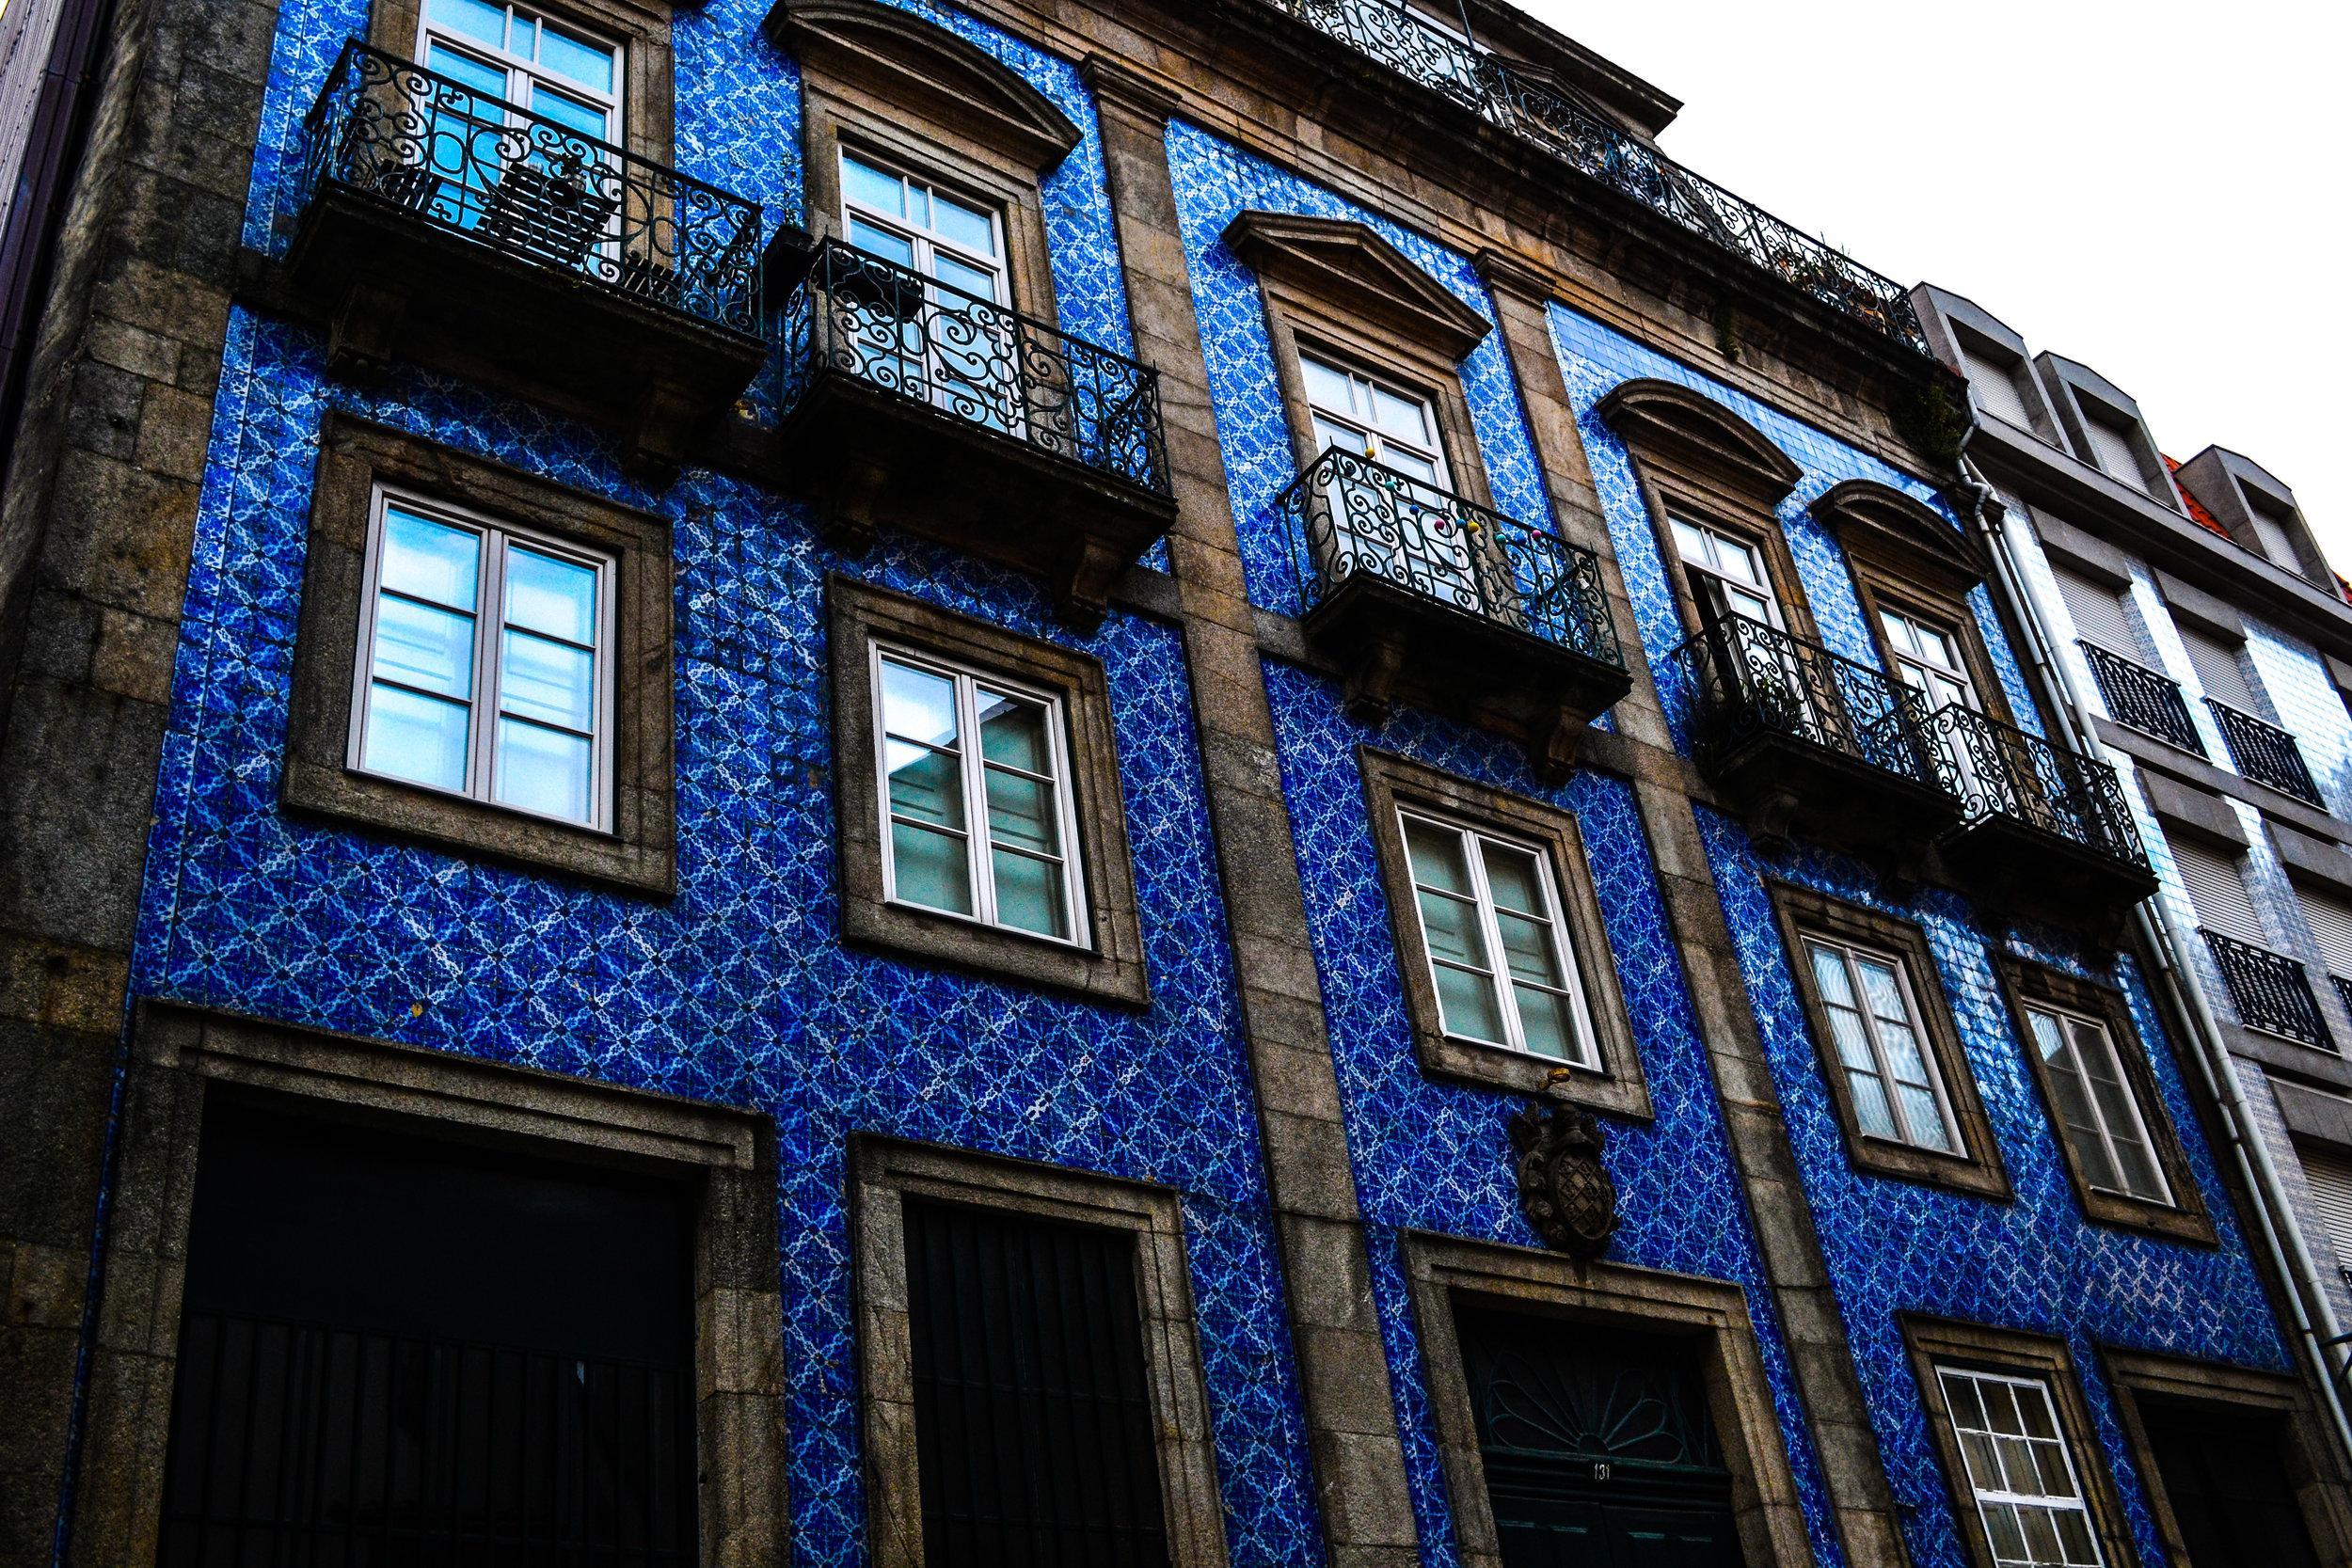 Blue Portugal Home.jpg